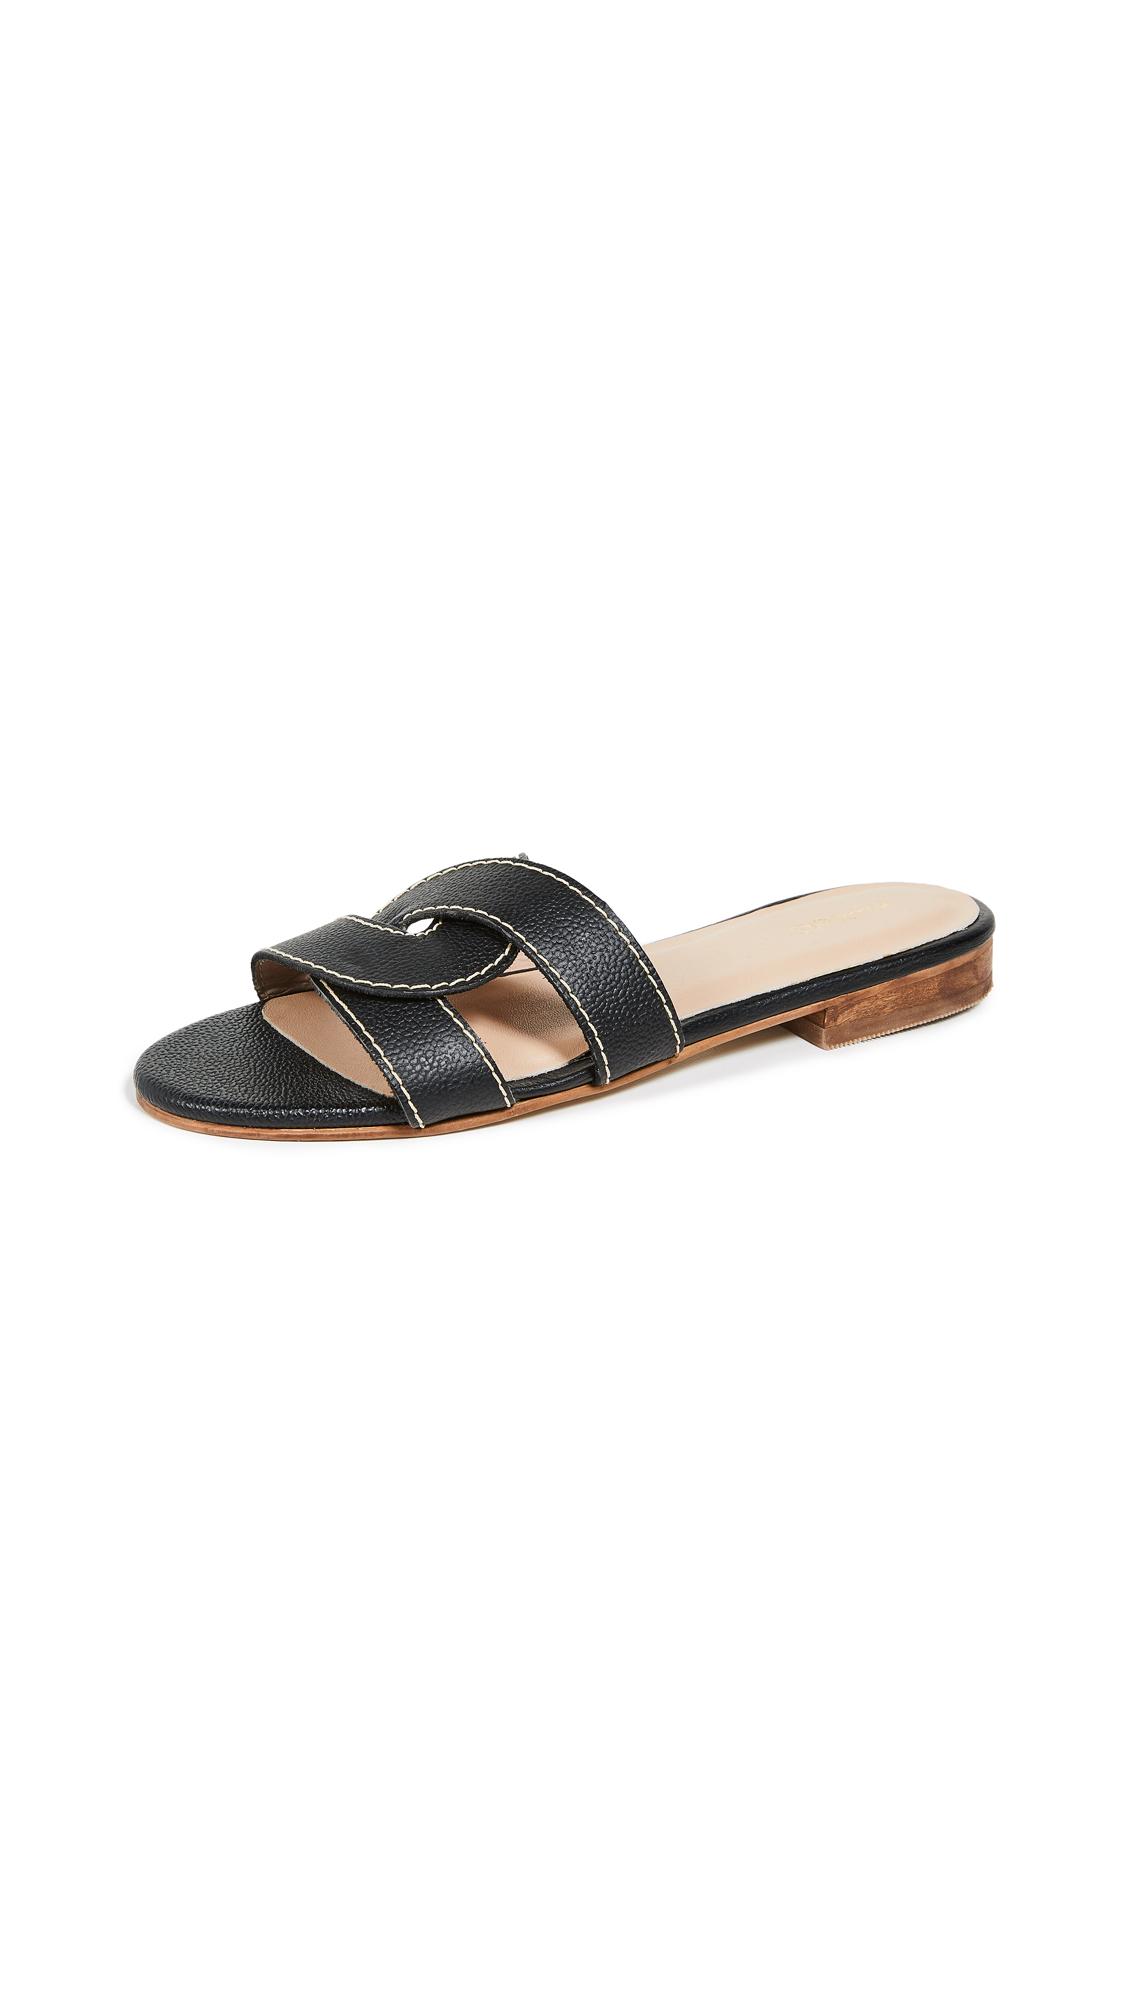 KAANAS Santorini Infinity Sandals - Black